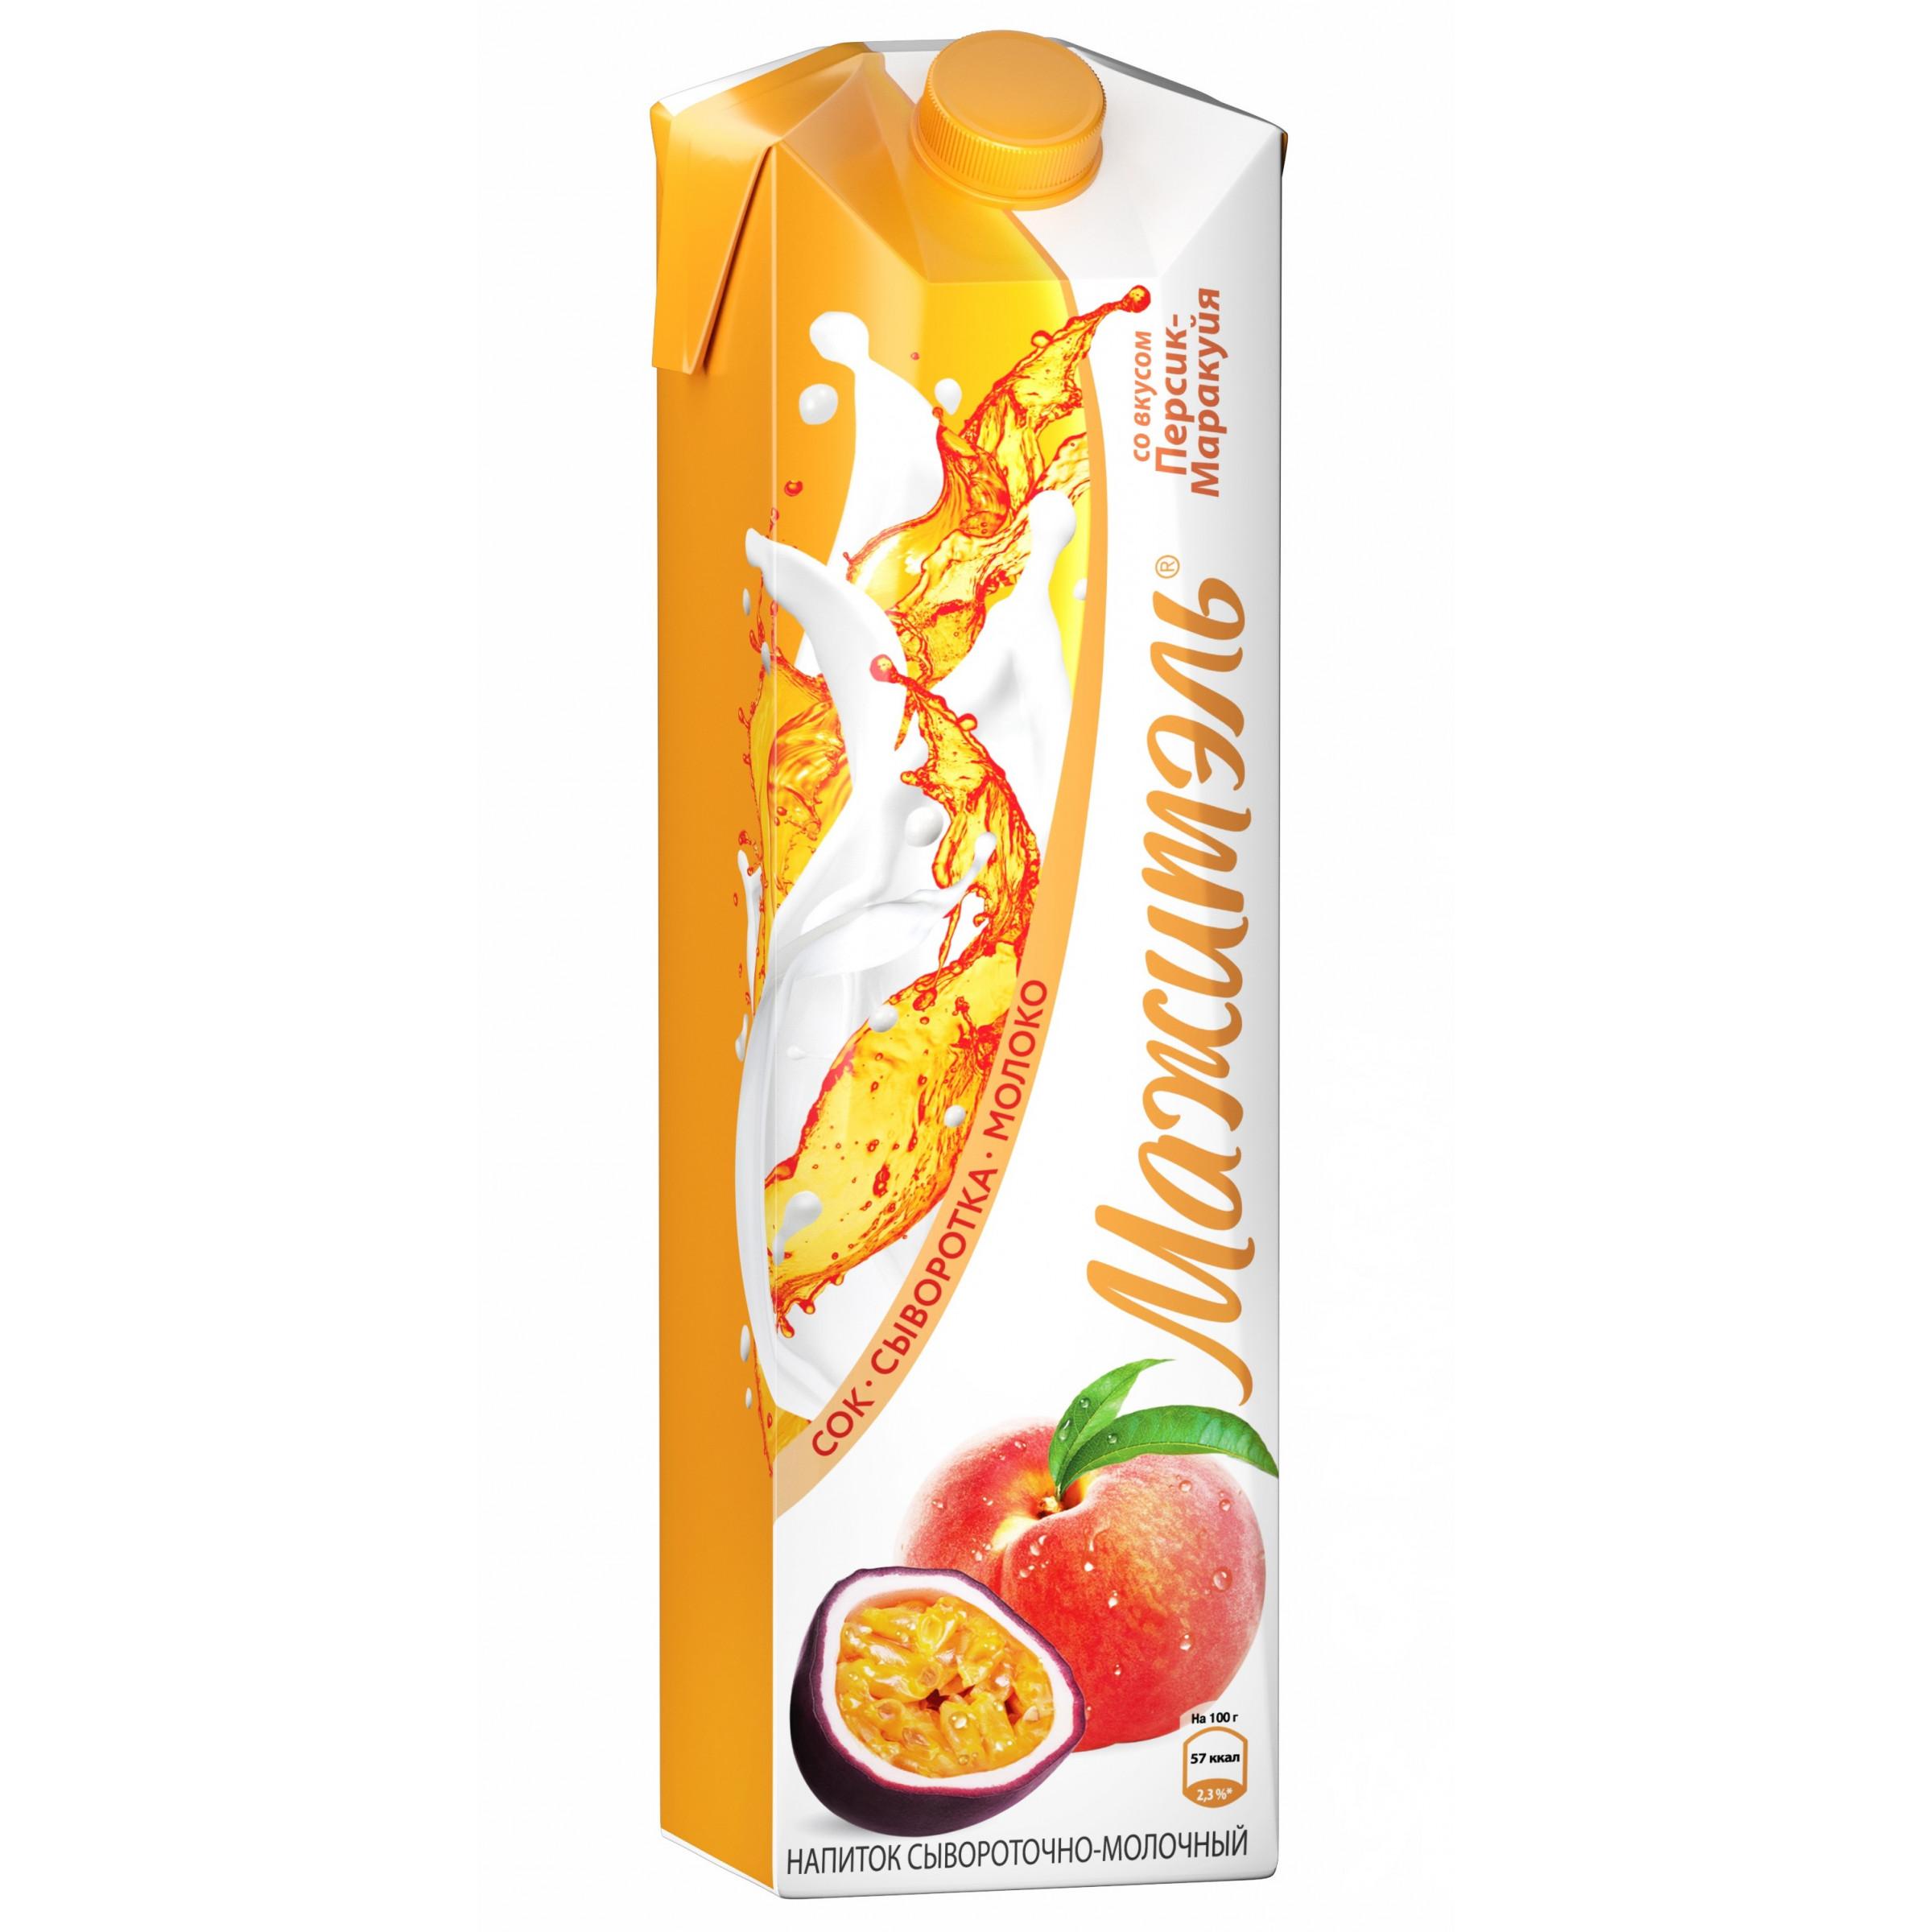 Коктейль Neo Мажитэль персик-маракуйя, 950г